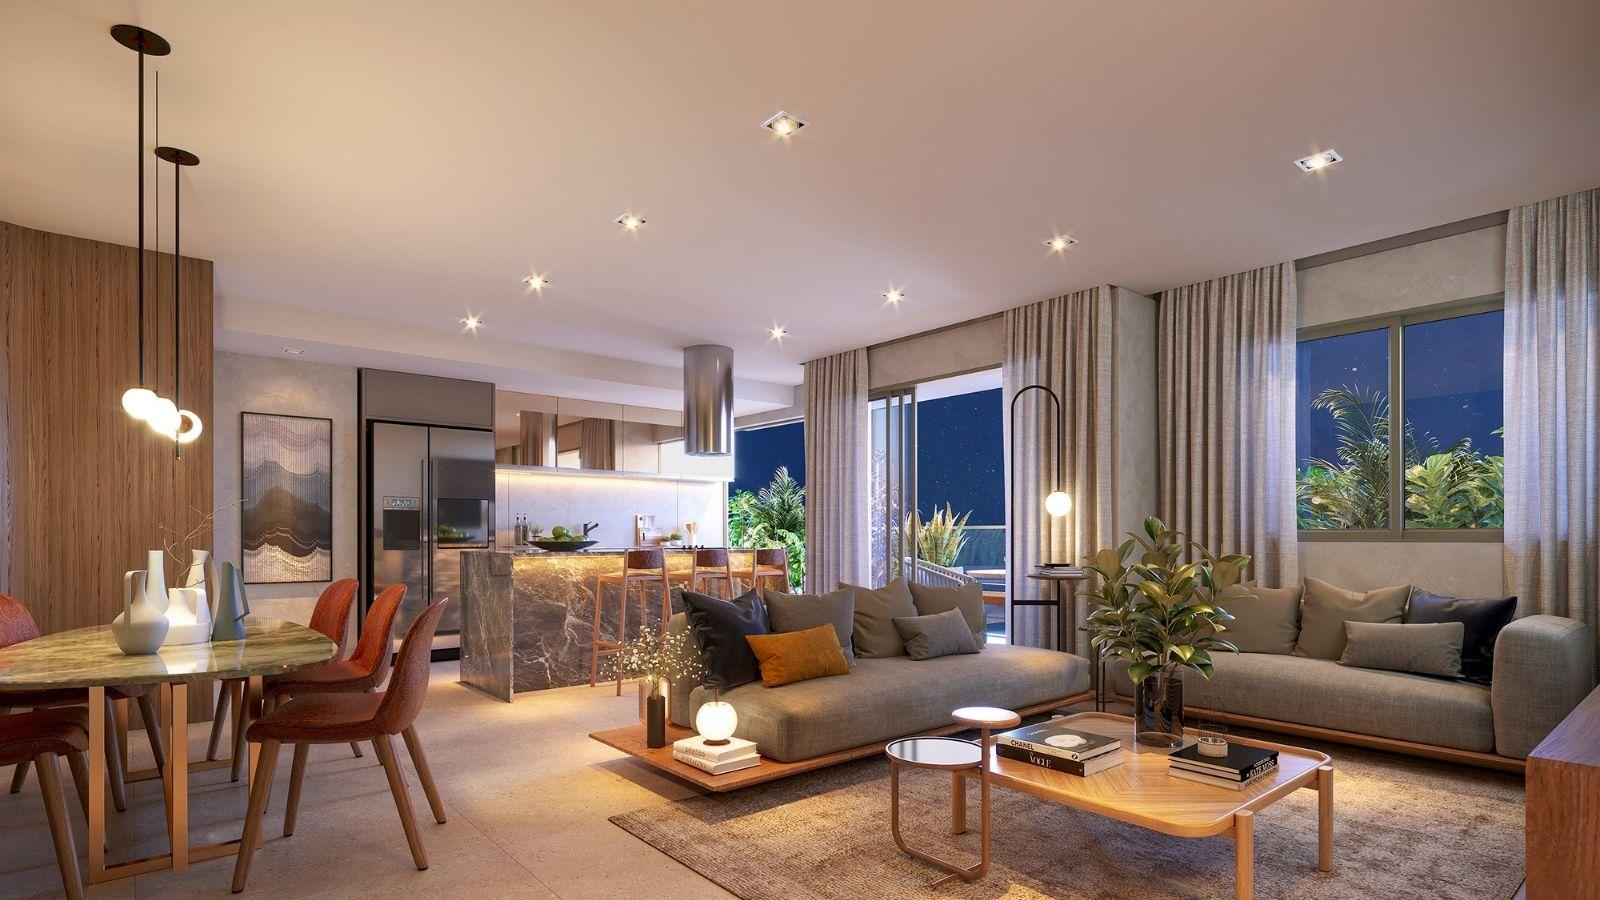 Perspectiva ilustrada do Apartamento decorado - Sala